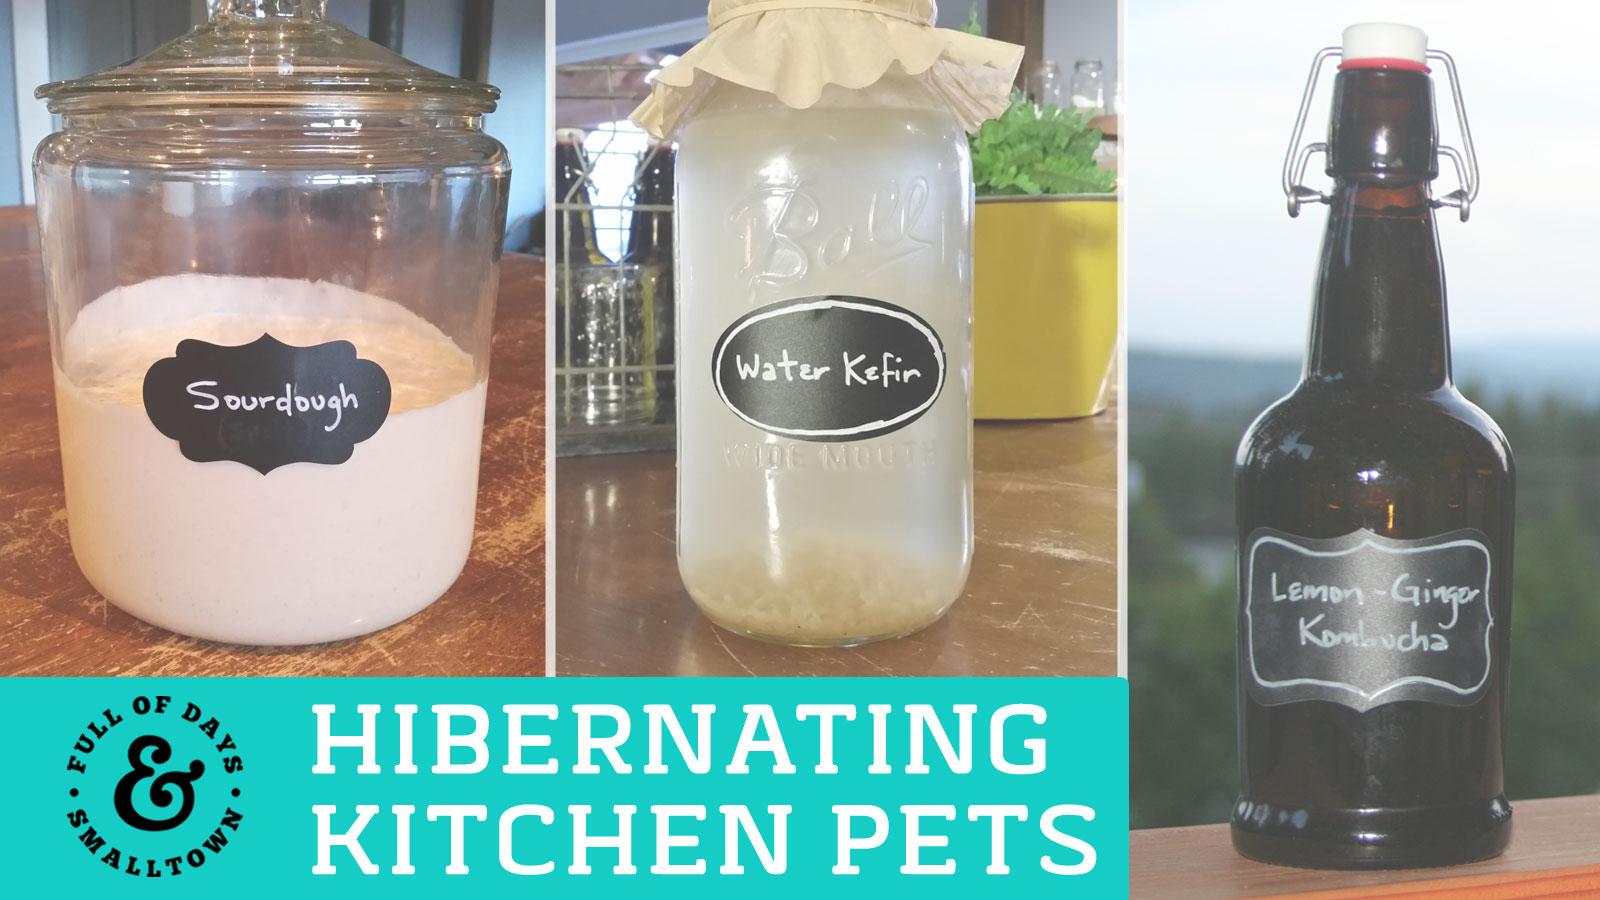 Hibernating-Kitchen-Pets_Full-of-Days_1600-x-900